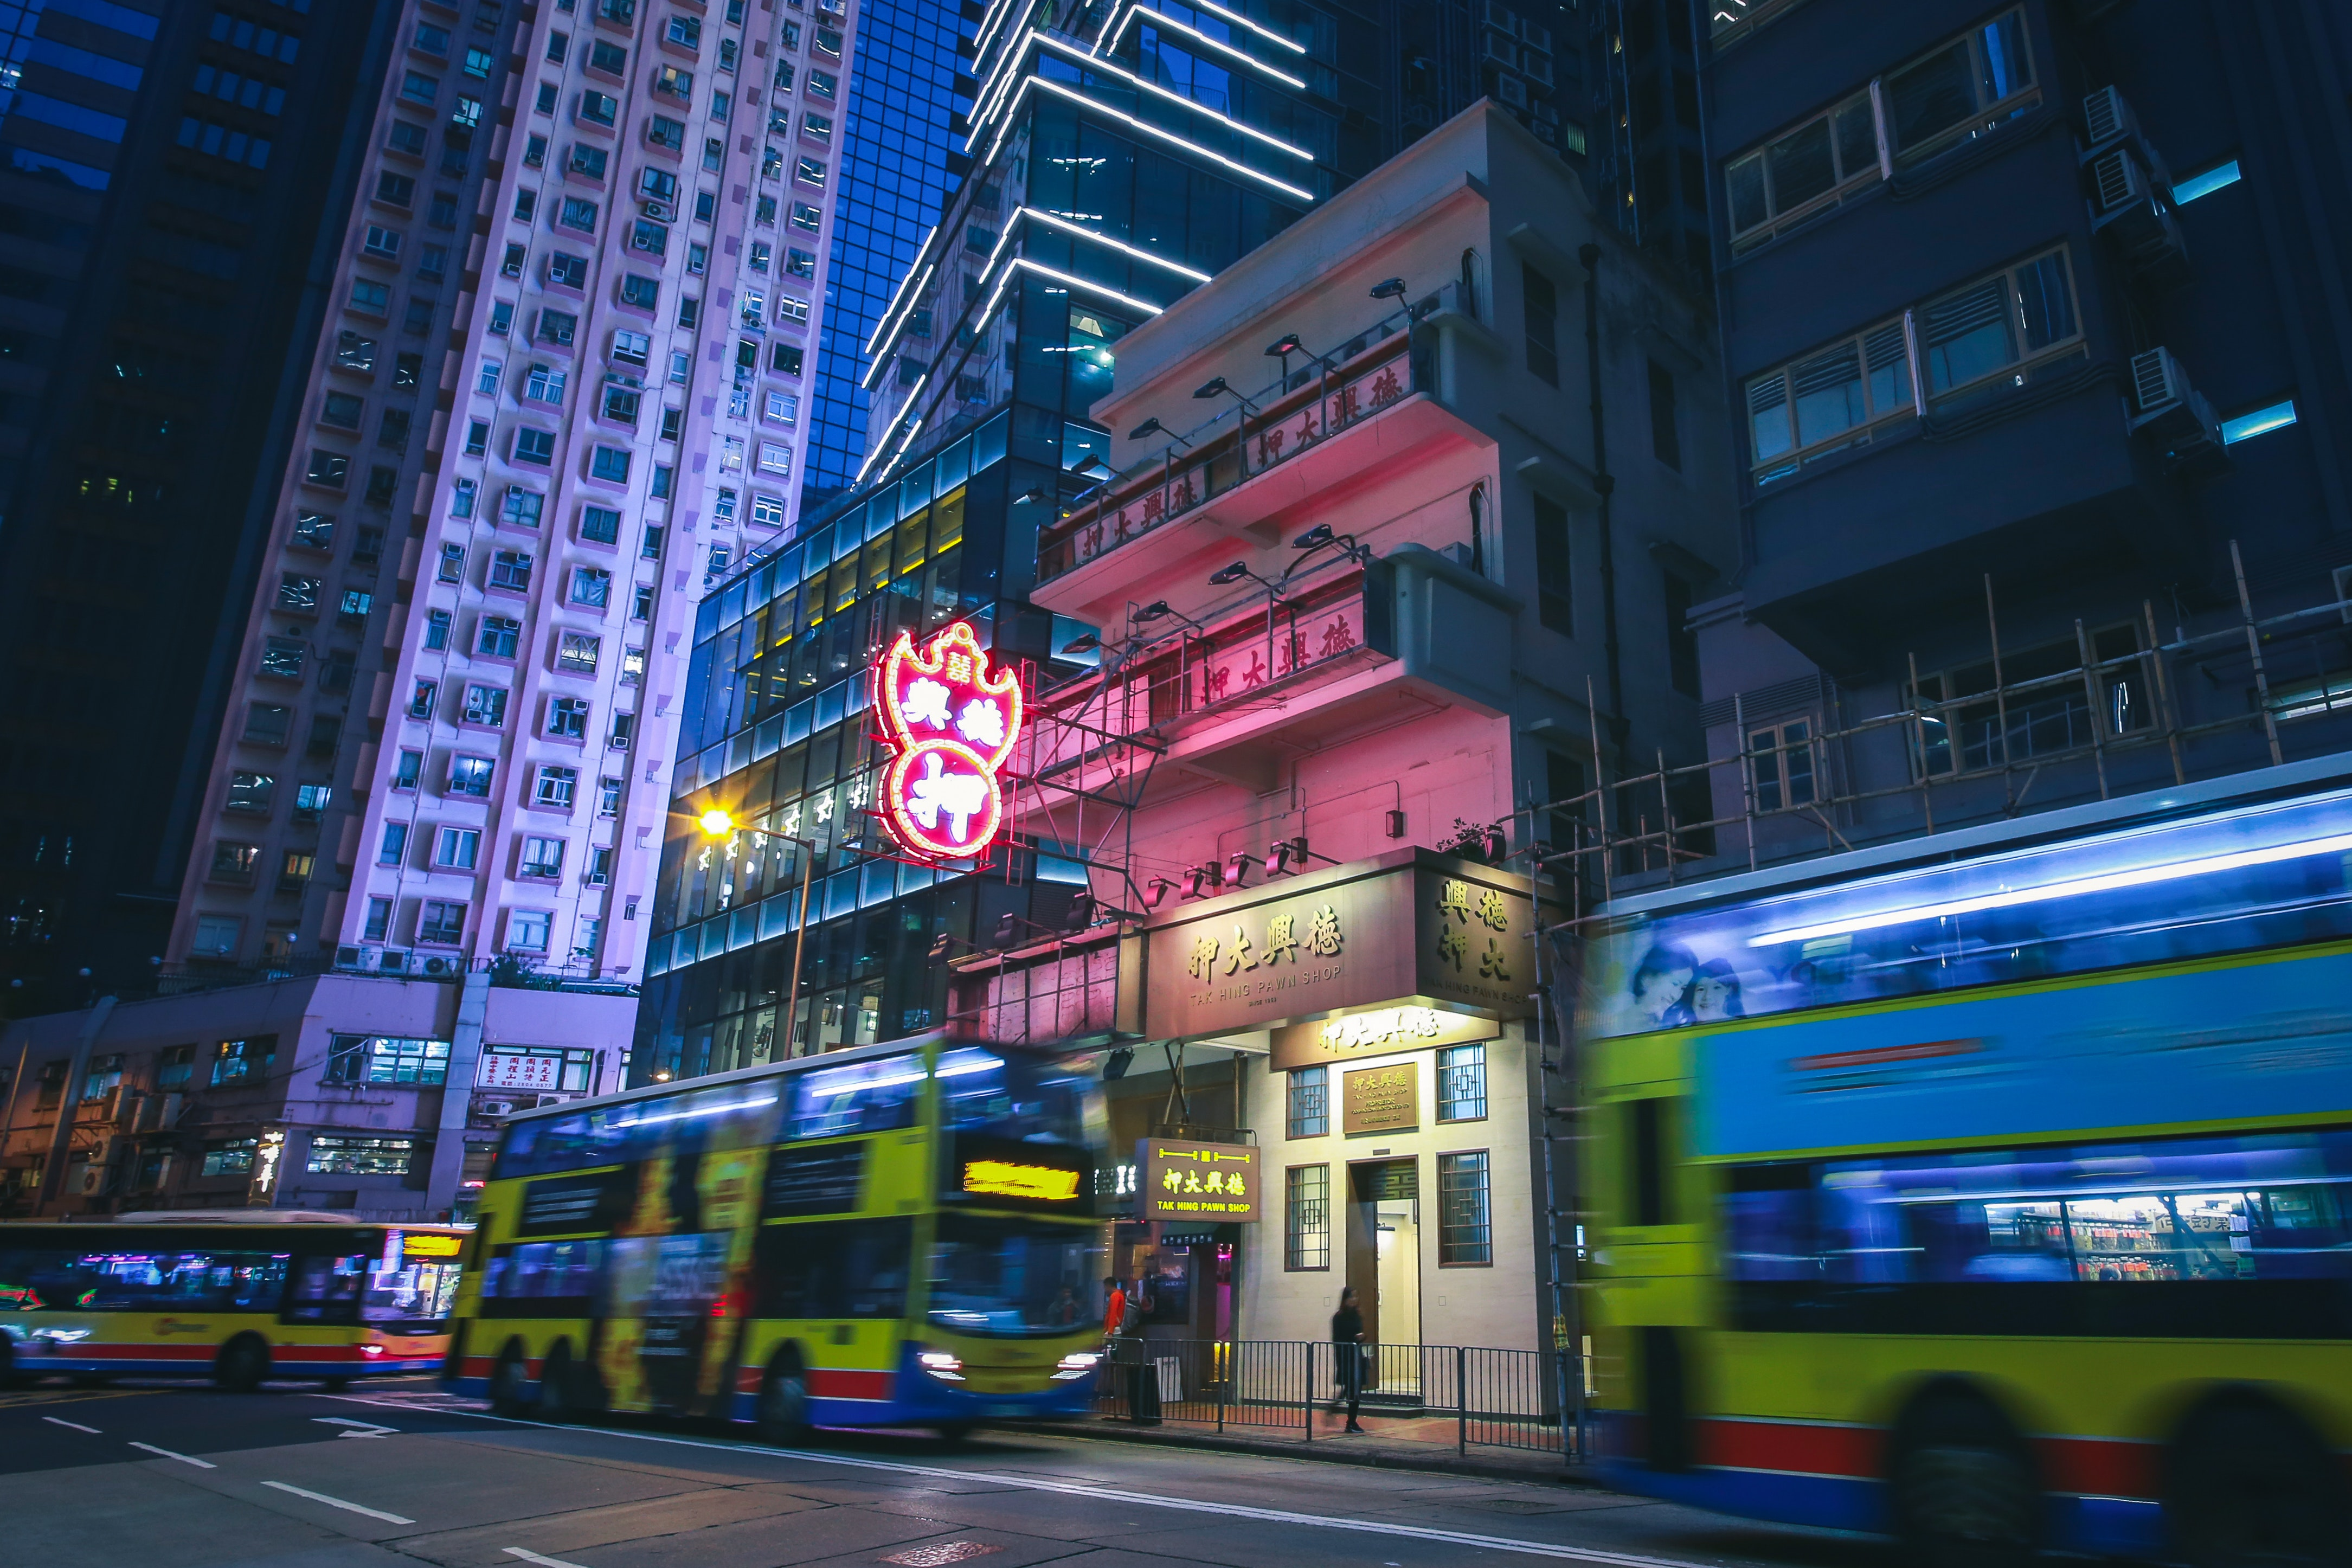 buildings-in-downtown-hong-kong-at-night-1565685